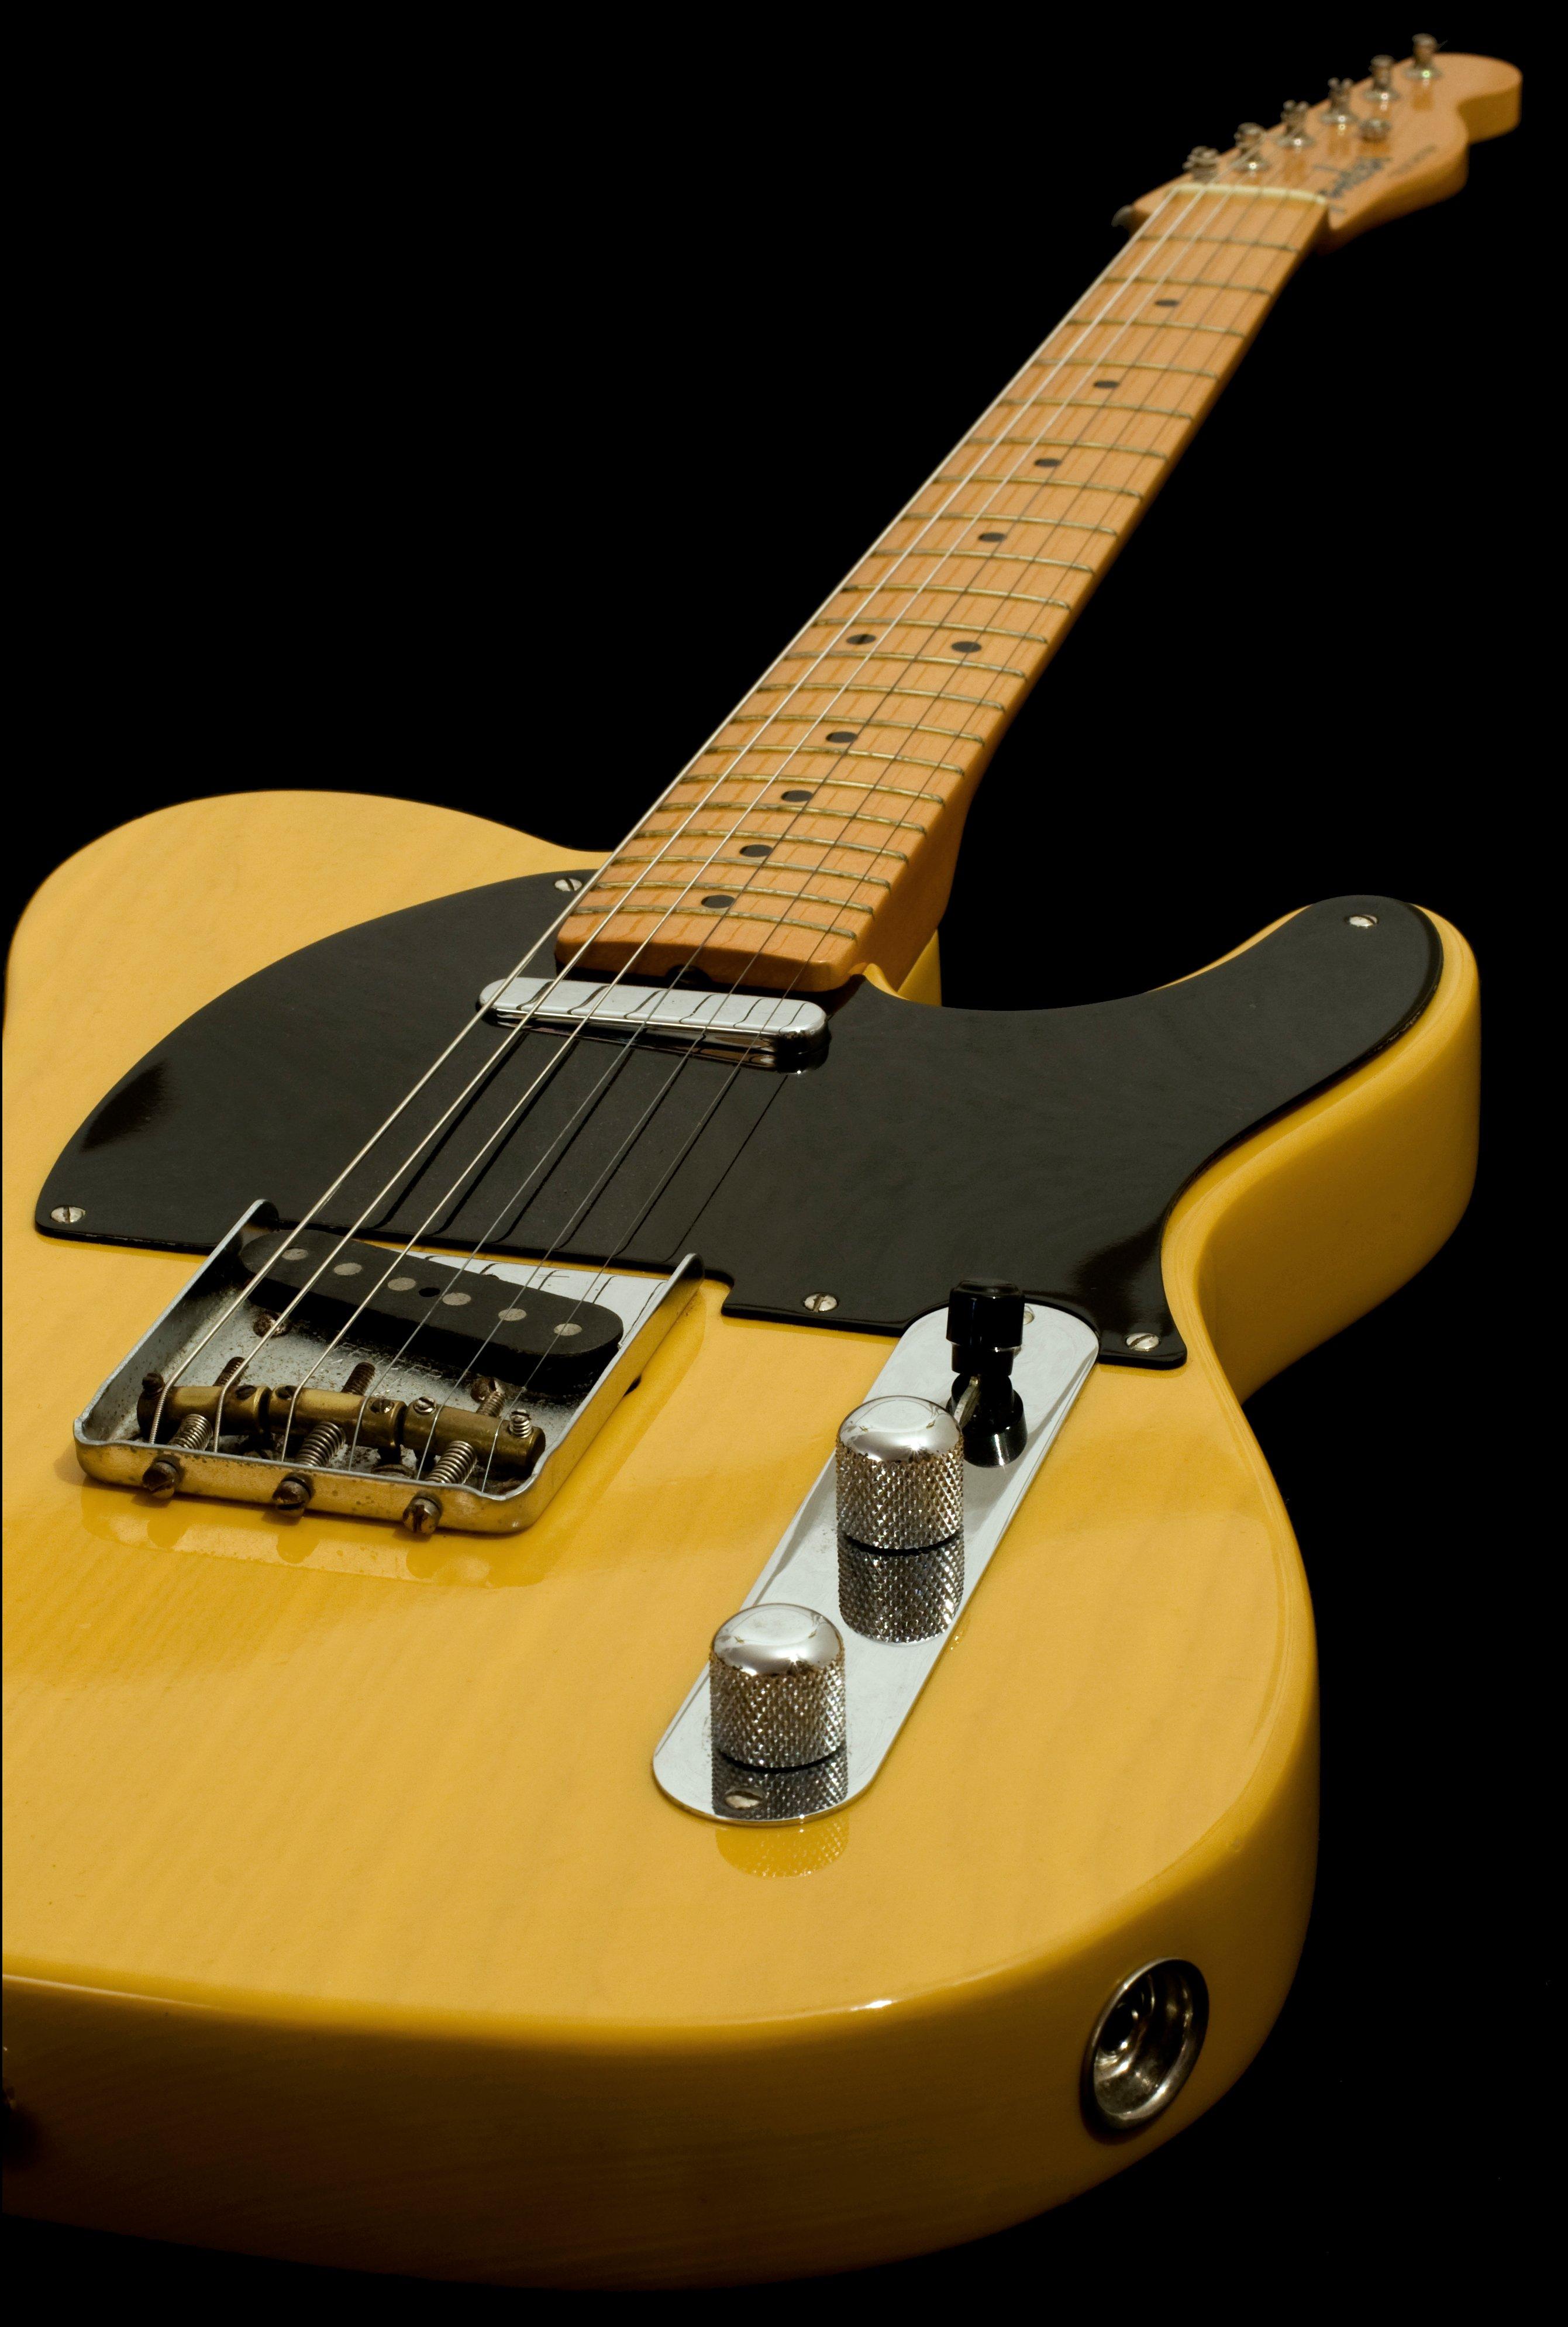 52 Fender Telecaster guitar fender telecaster ash tele blonde leo 2681x3978